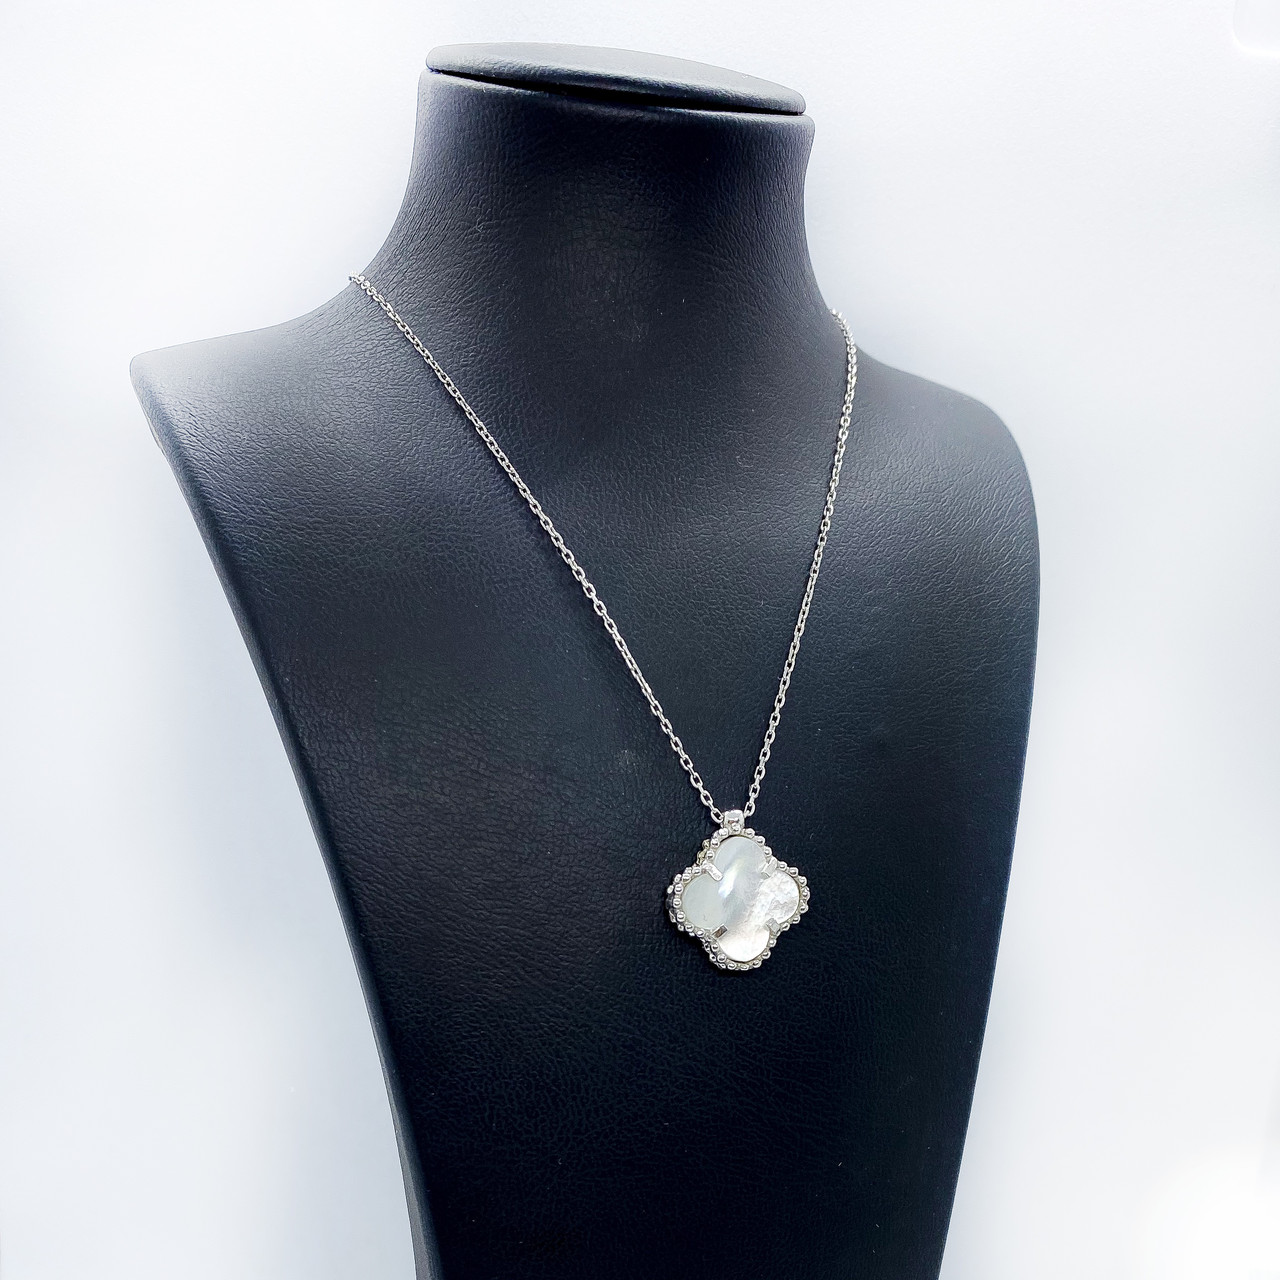 Кулон из серебра Beauty Bar  в стиле Van Cleef & Arpels с жемчугом